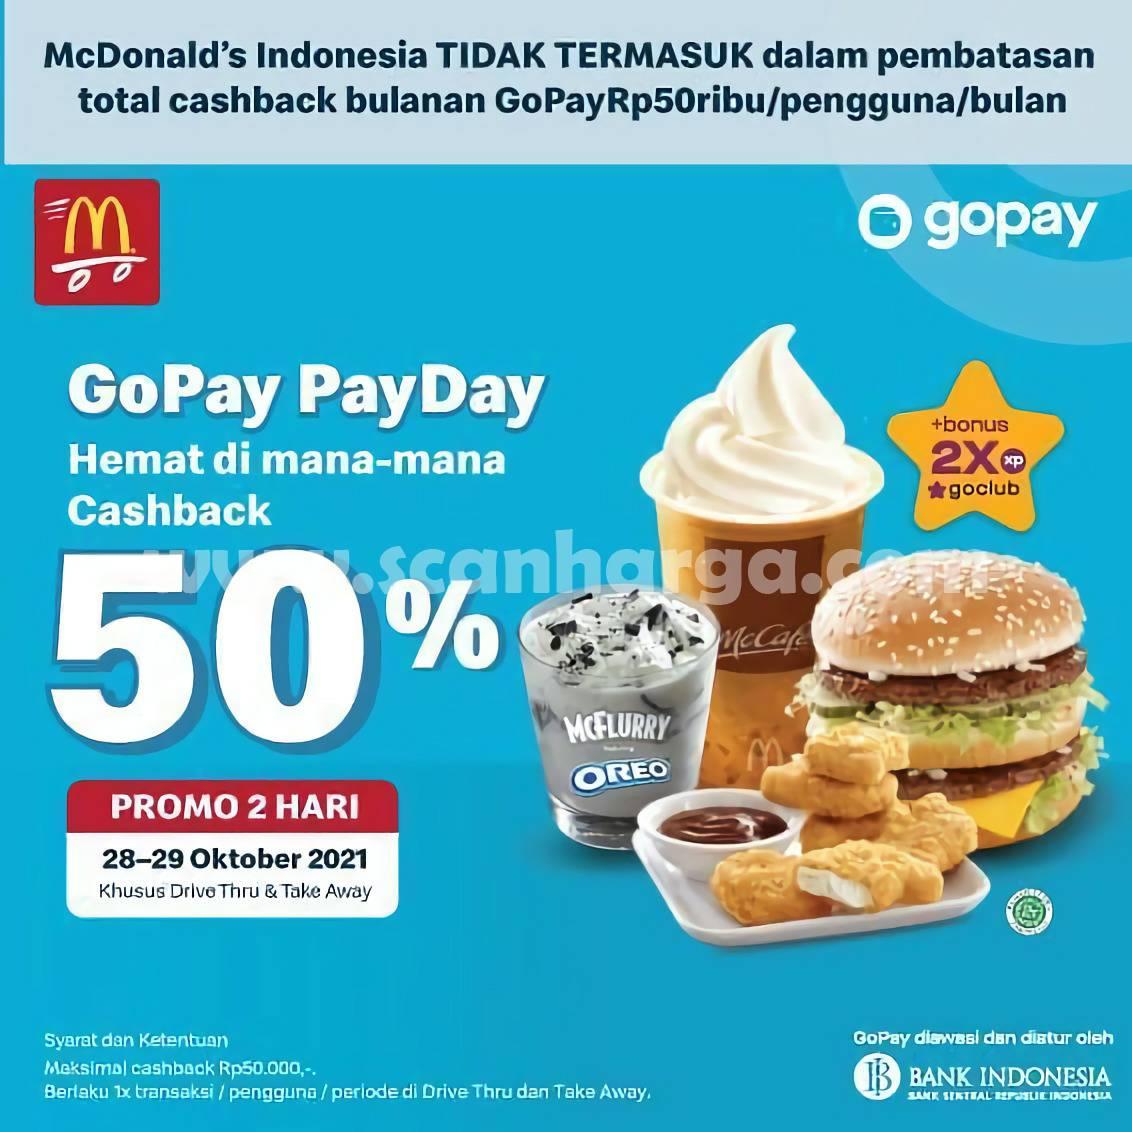 Promo McDonalds Gopay Payday Casback 50%